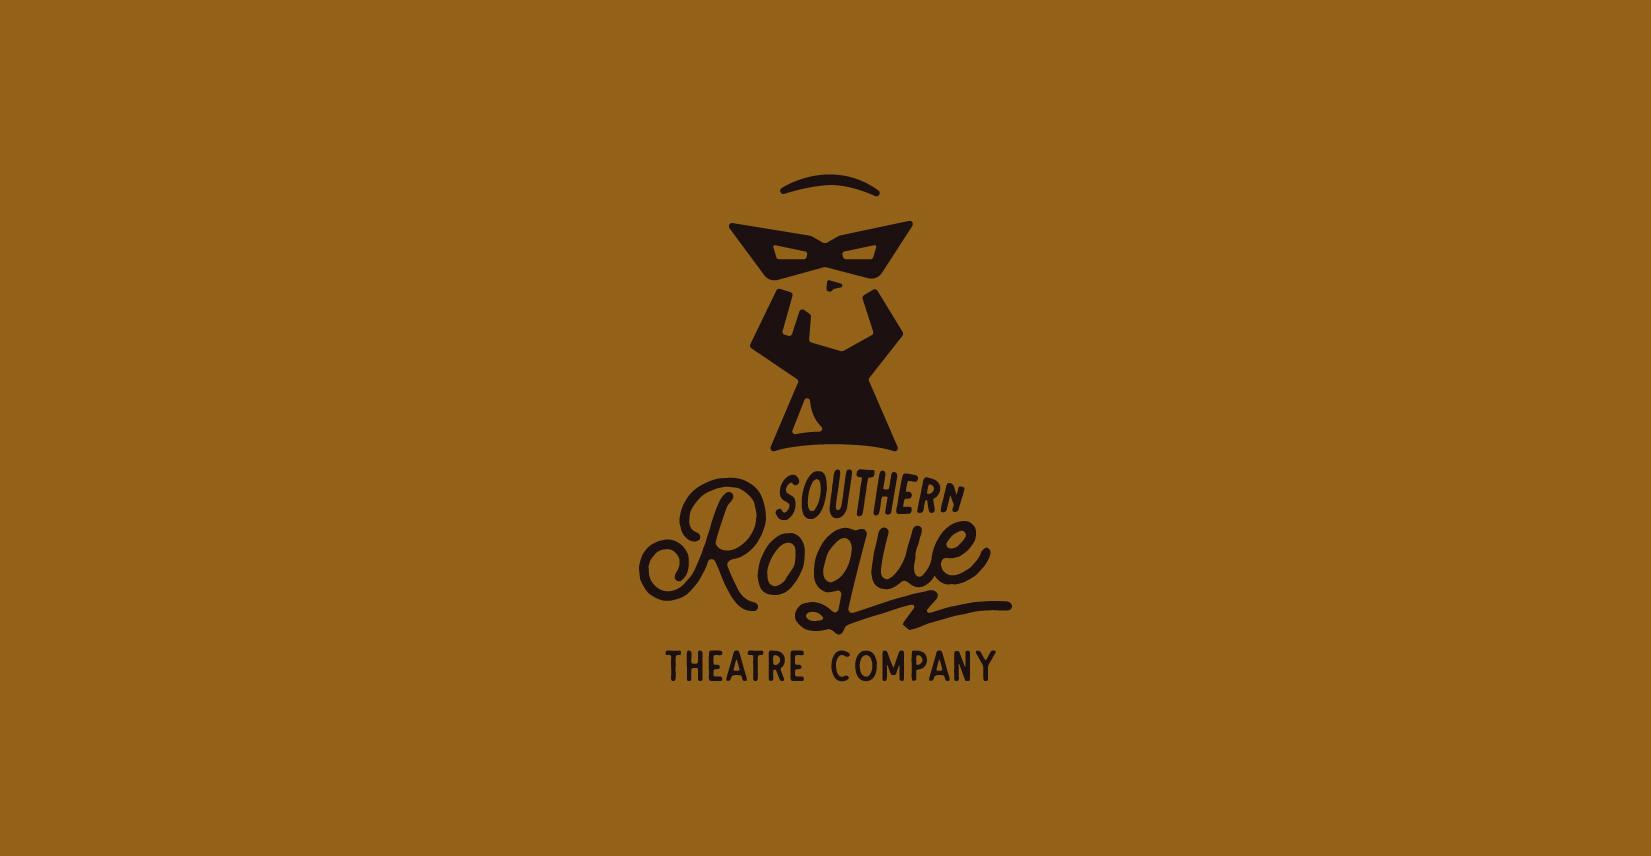 SouthernRogue_Logo_v2-refined_logo-3.jpg